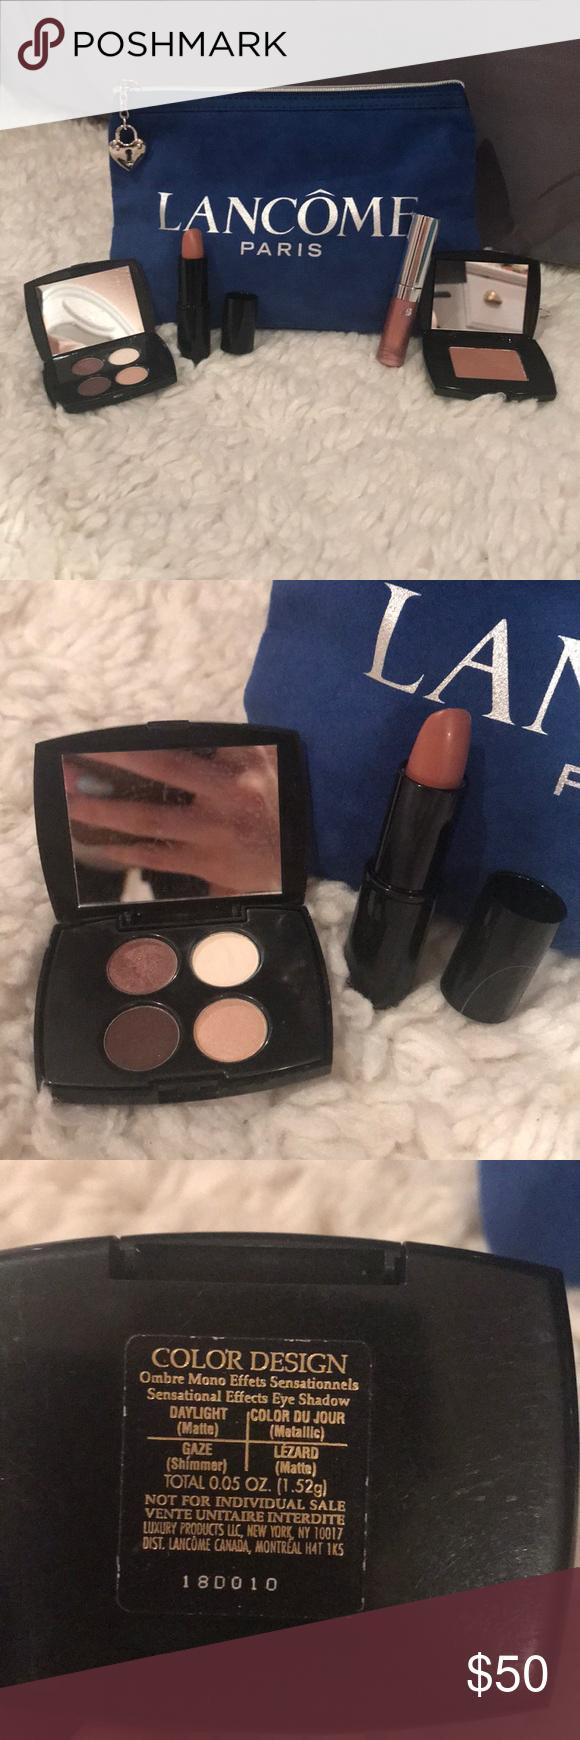 Lancôme makeup plus bag! 💄 Lancôme set includes makeup